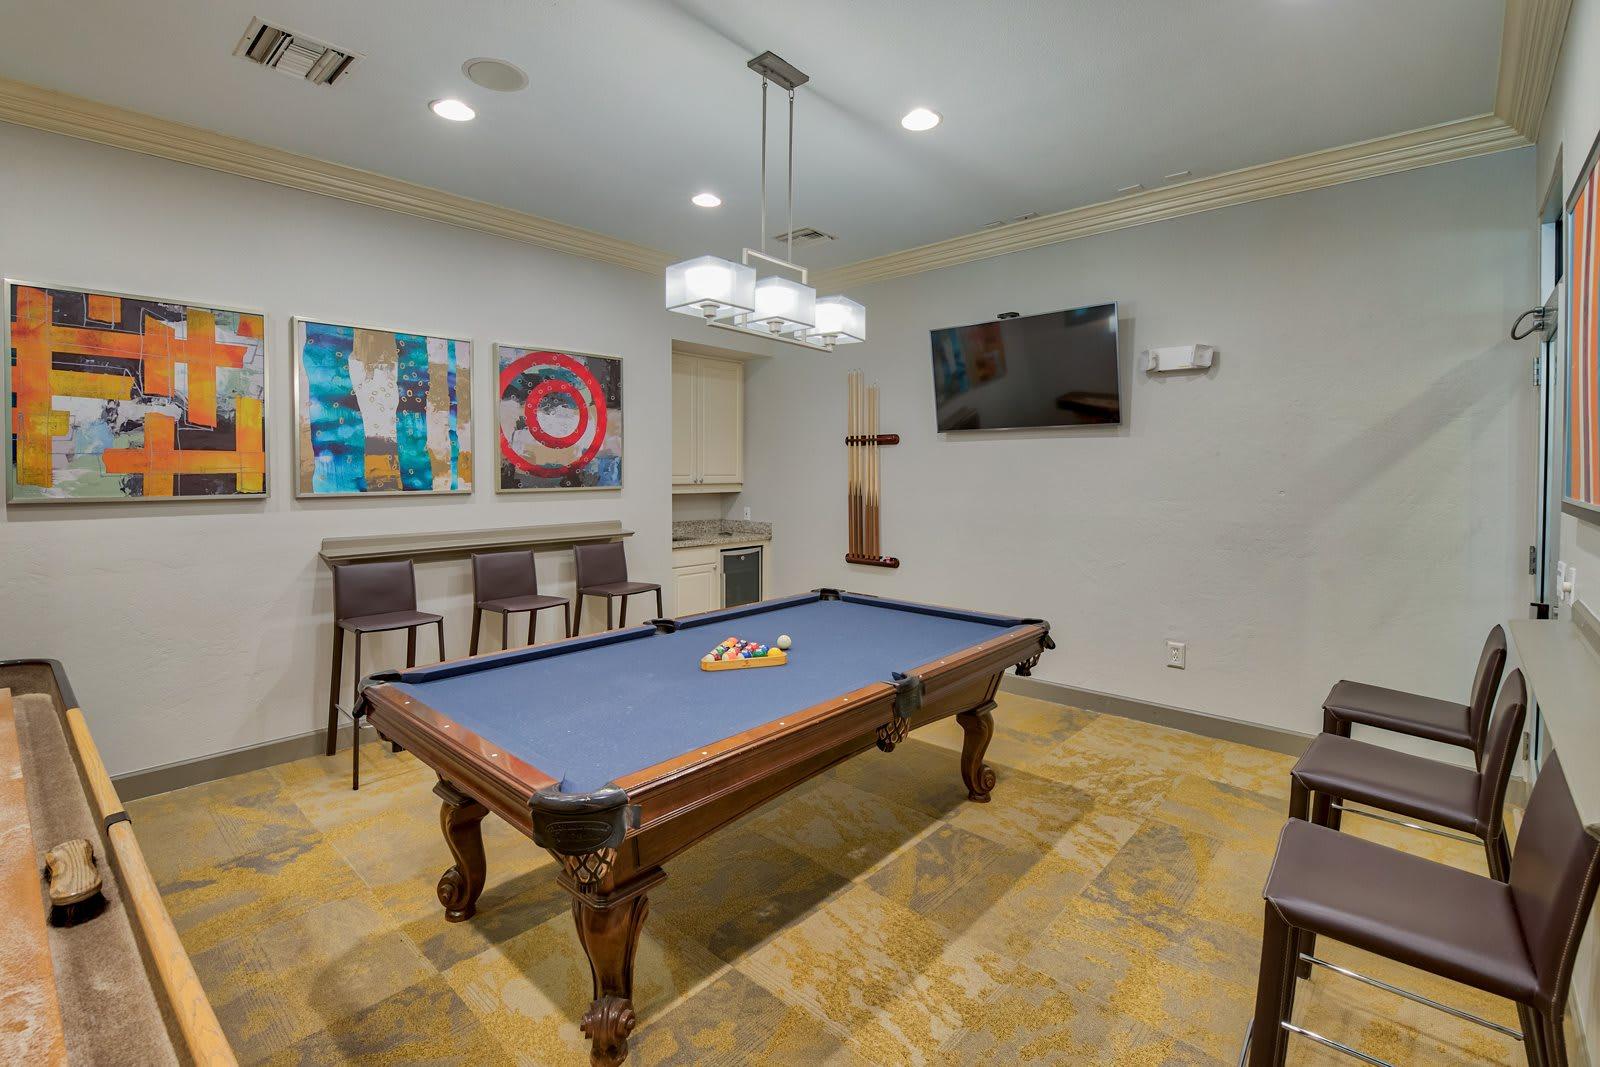 Billiards and Gaming Room at Windsor at Aviara, 6610 Ambrosia Lane, CA